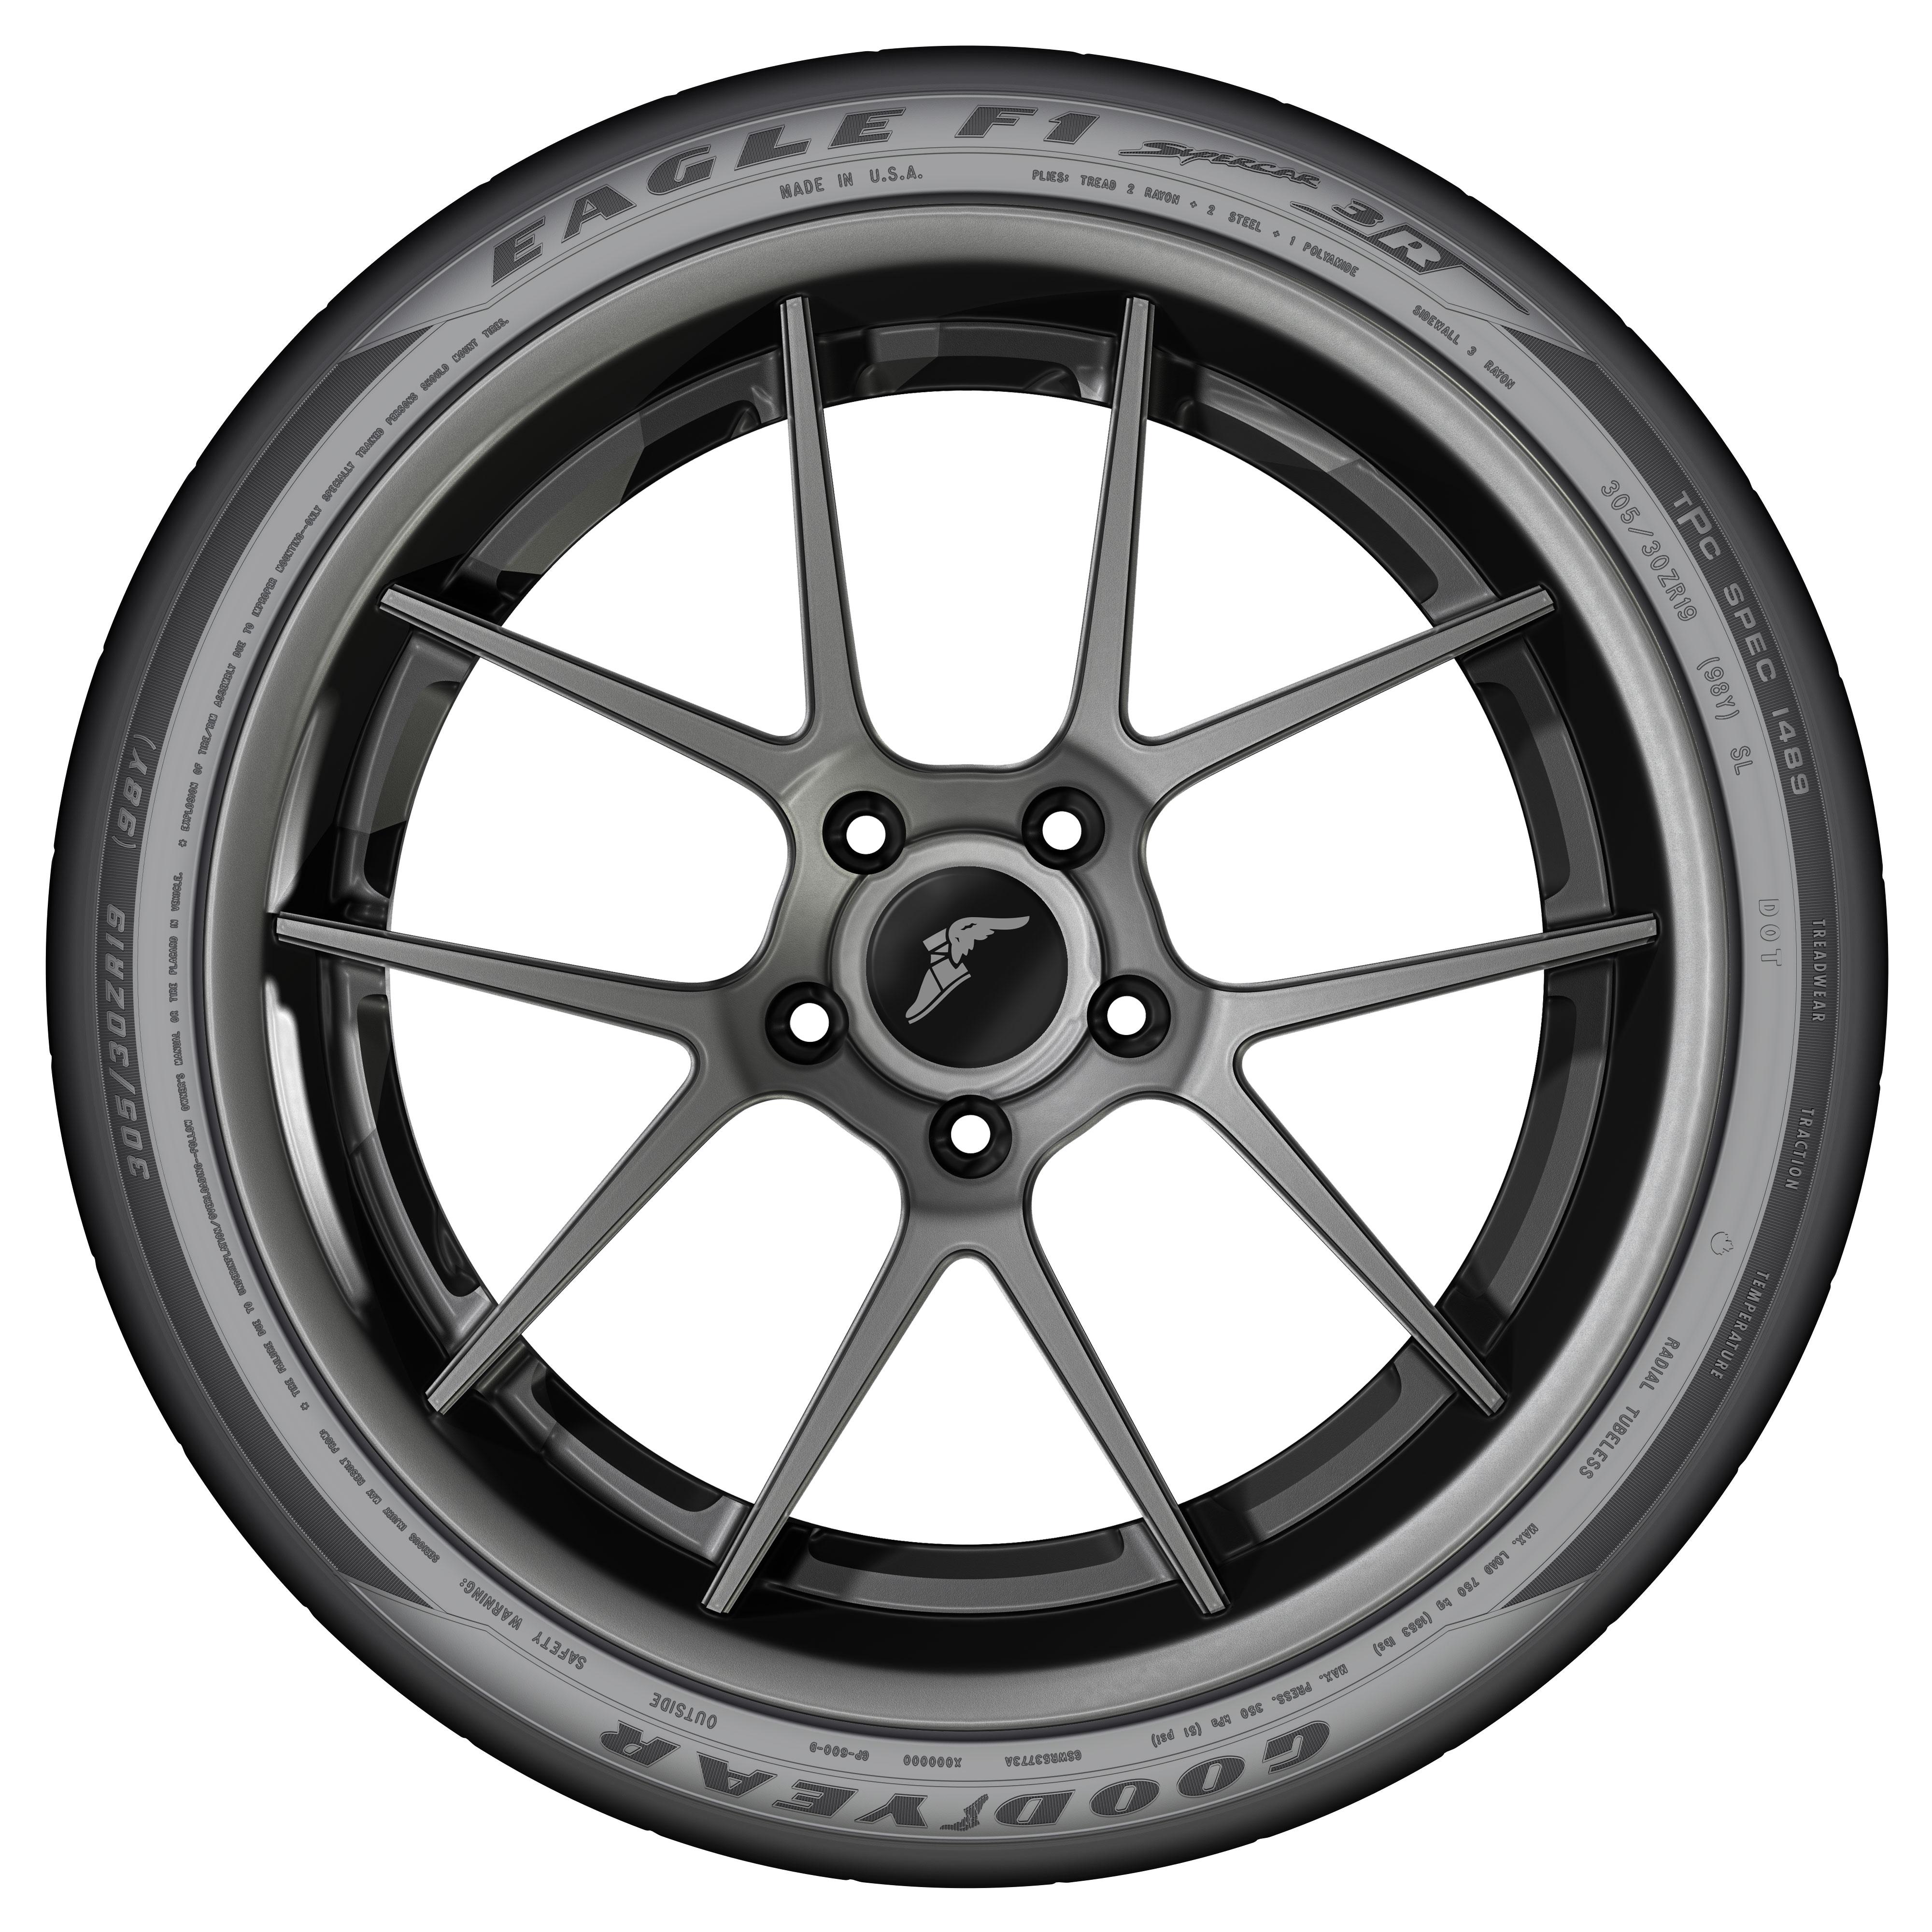 4000x4000 Summer Tires Canada Goodyear Tires Canada